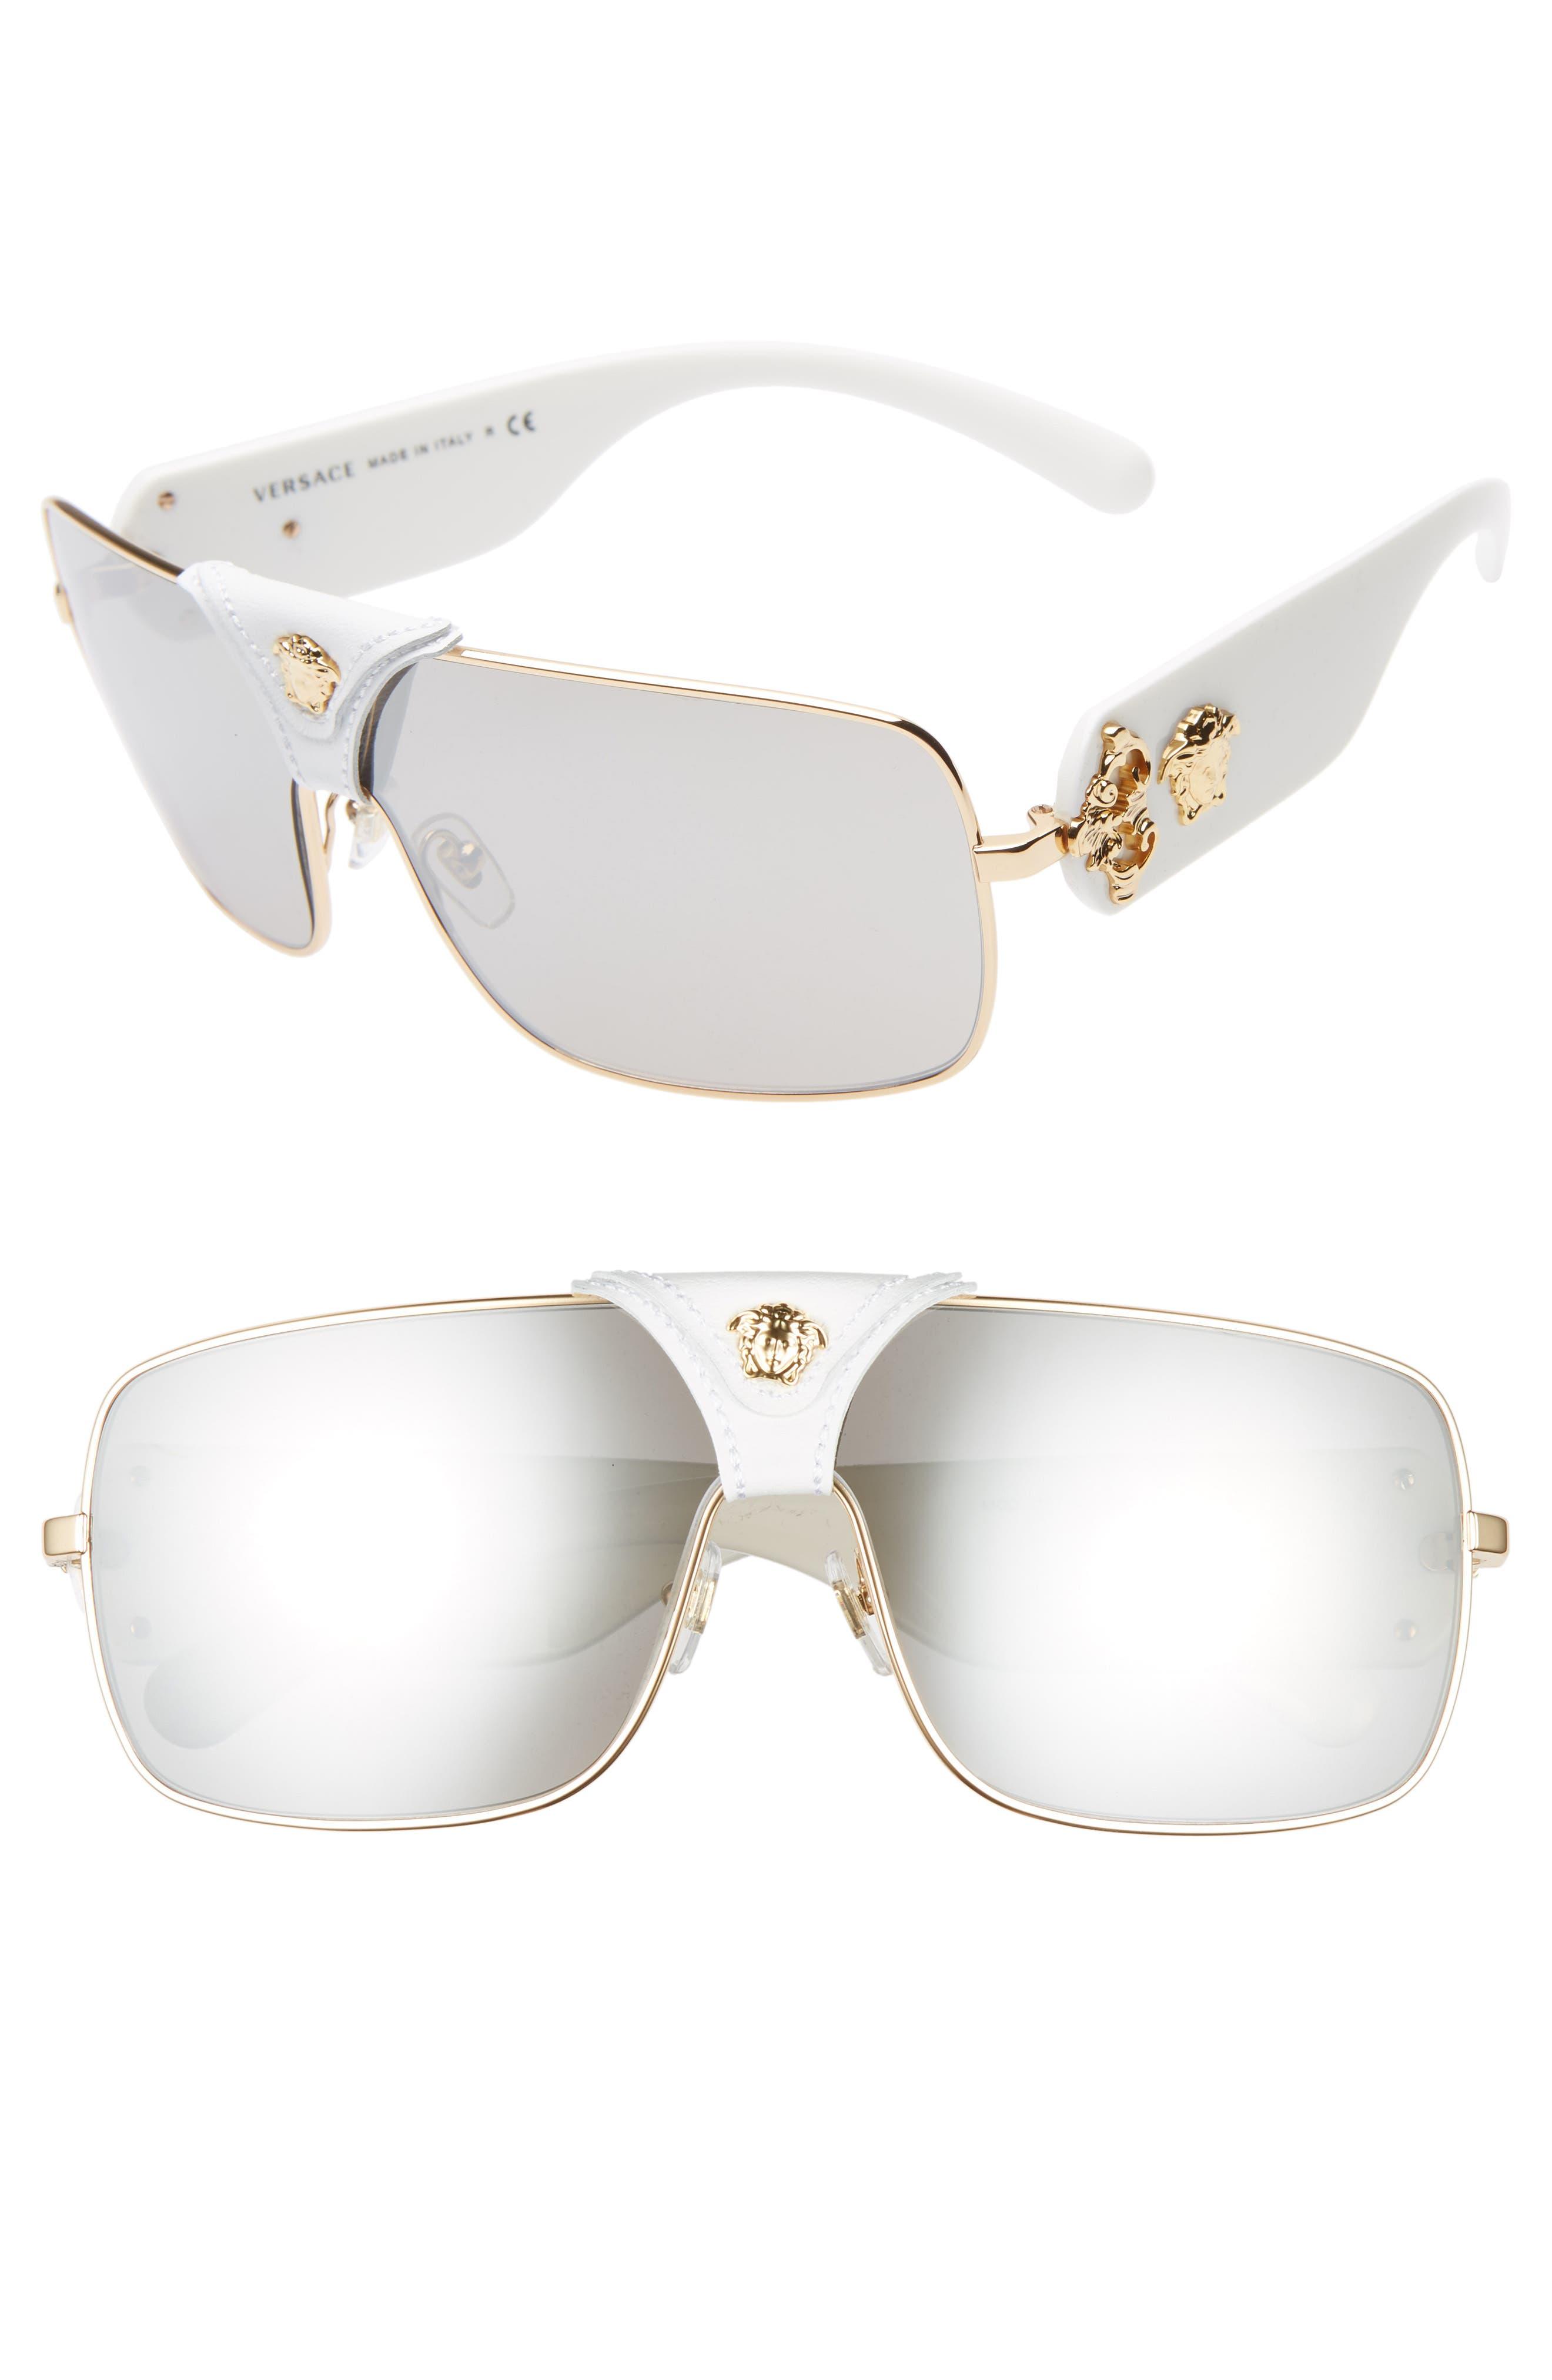 4aaf98cd726 Versace 145Mm Mirrored Shield Sunglasses - Black  Gold